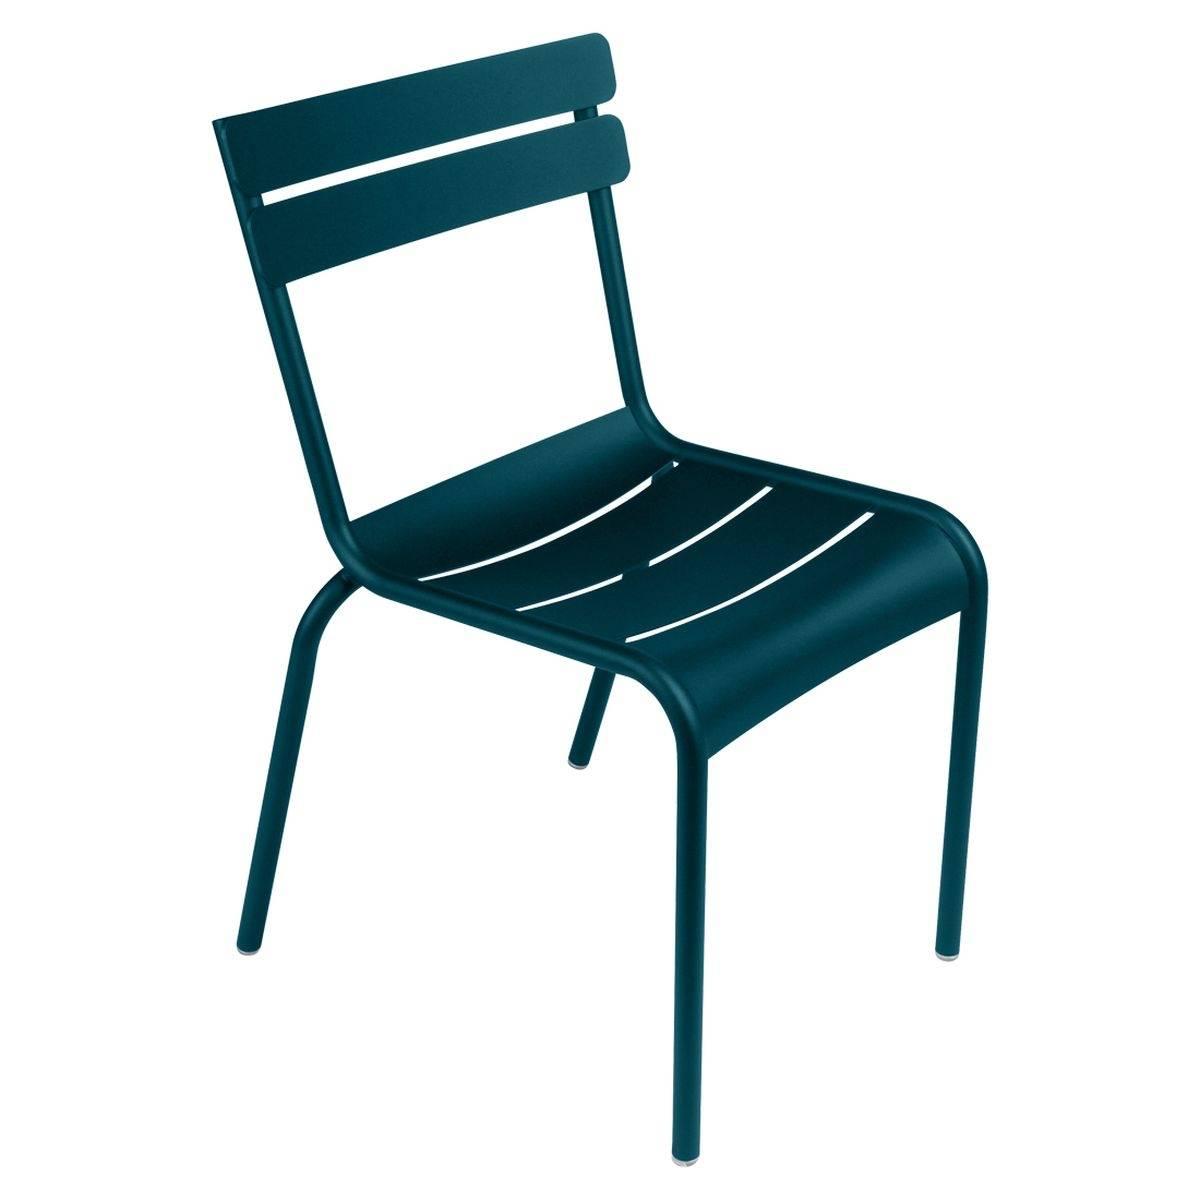 Outstanding Fermob Luxembourg Chair Outdoor Furniture Jardin Nz Theyellowbook Wood Chair Design Ideas Theyellowbookinfo